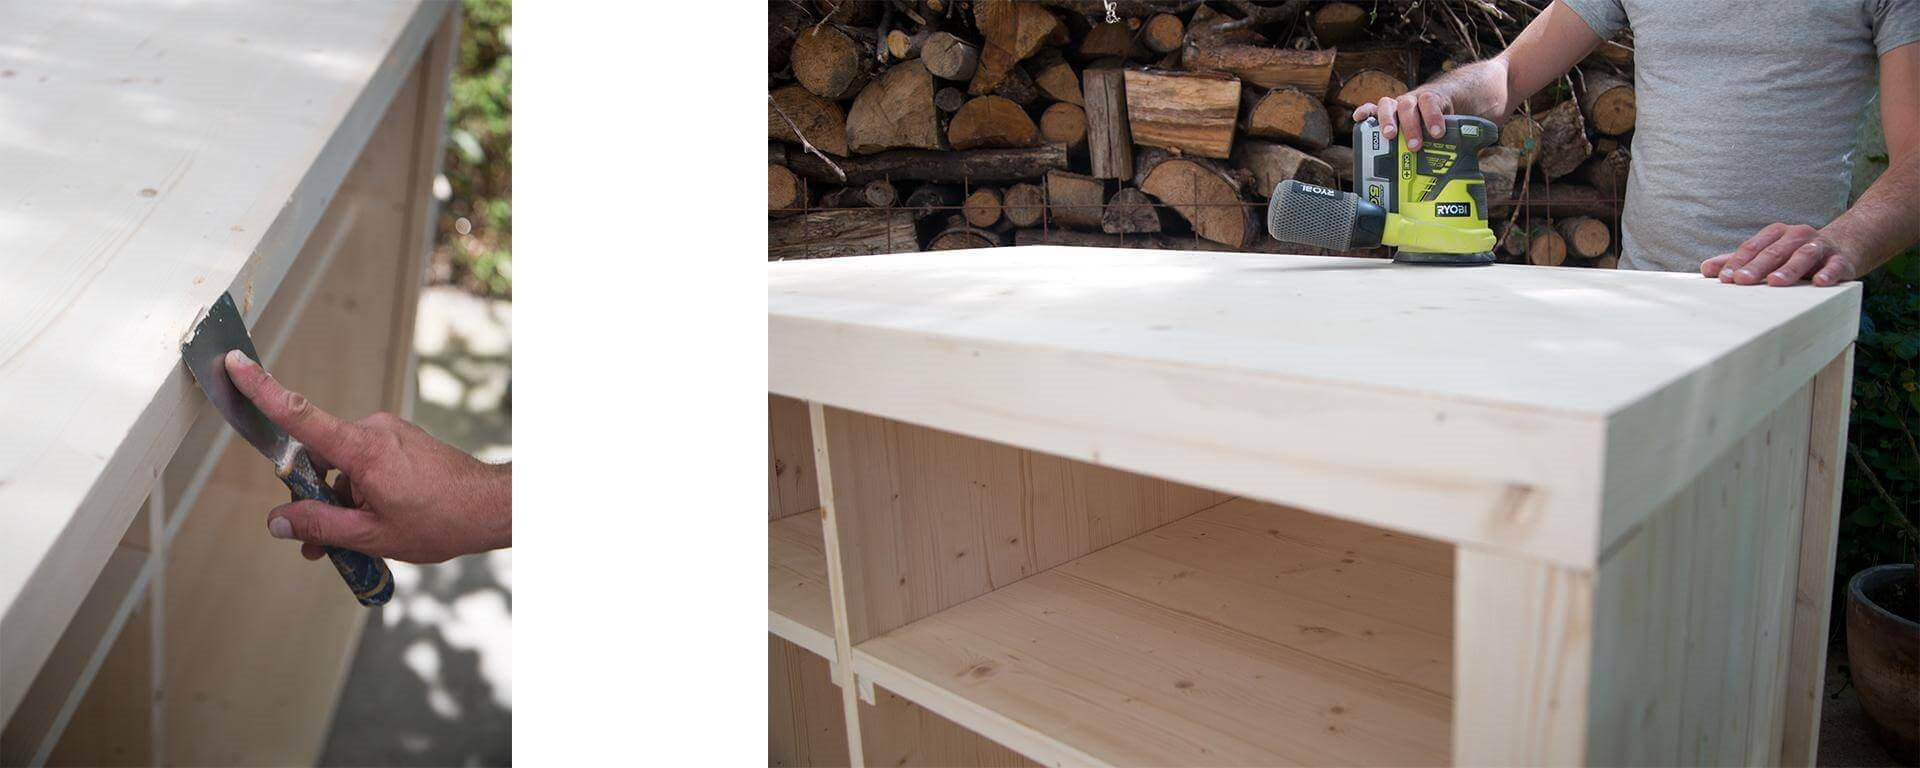 fabriquer un bar tutoriel de bricolage. Black Bedroom Furniture Sets. Home Design Ideas